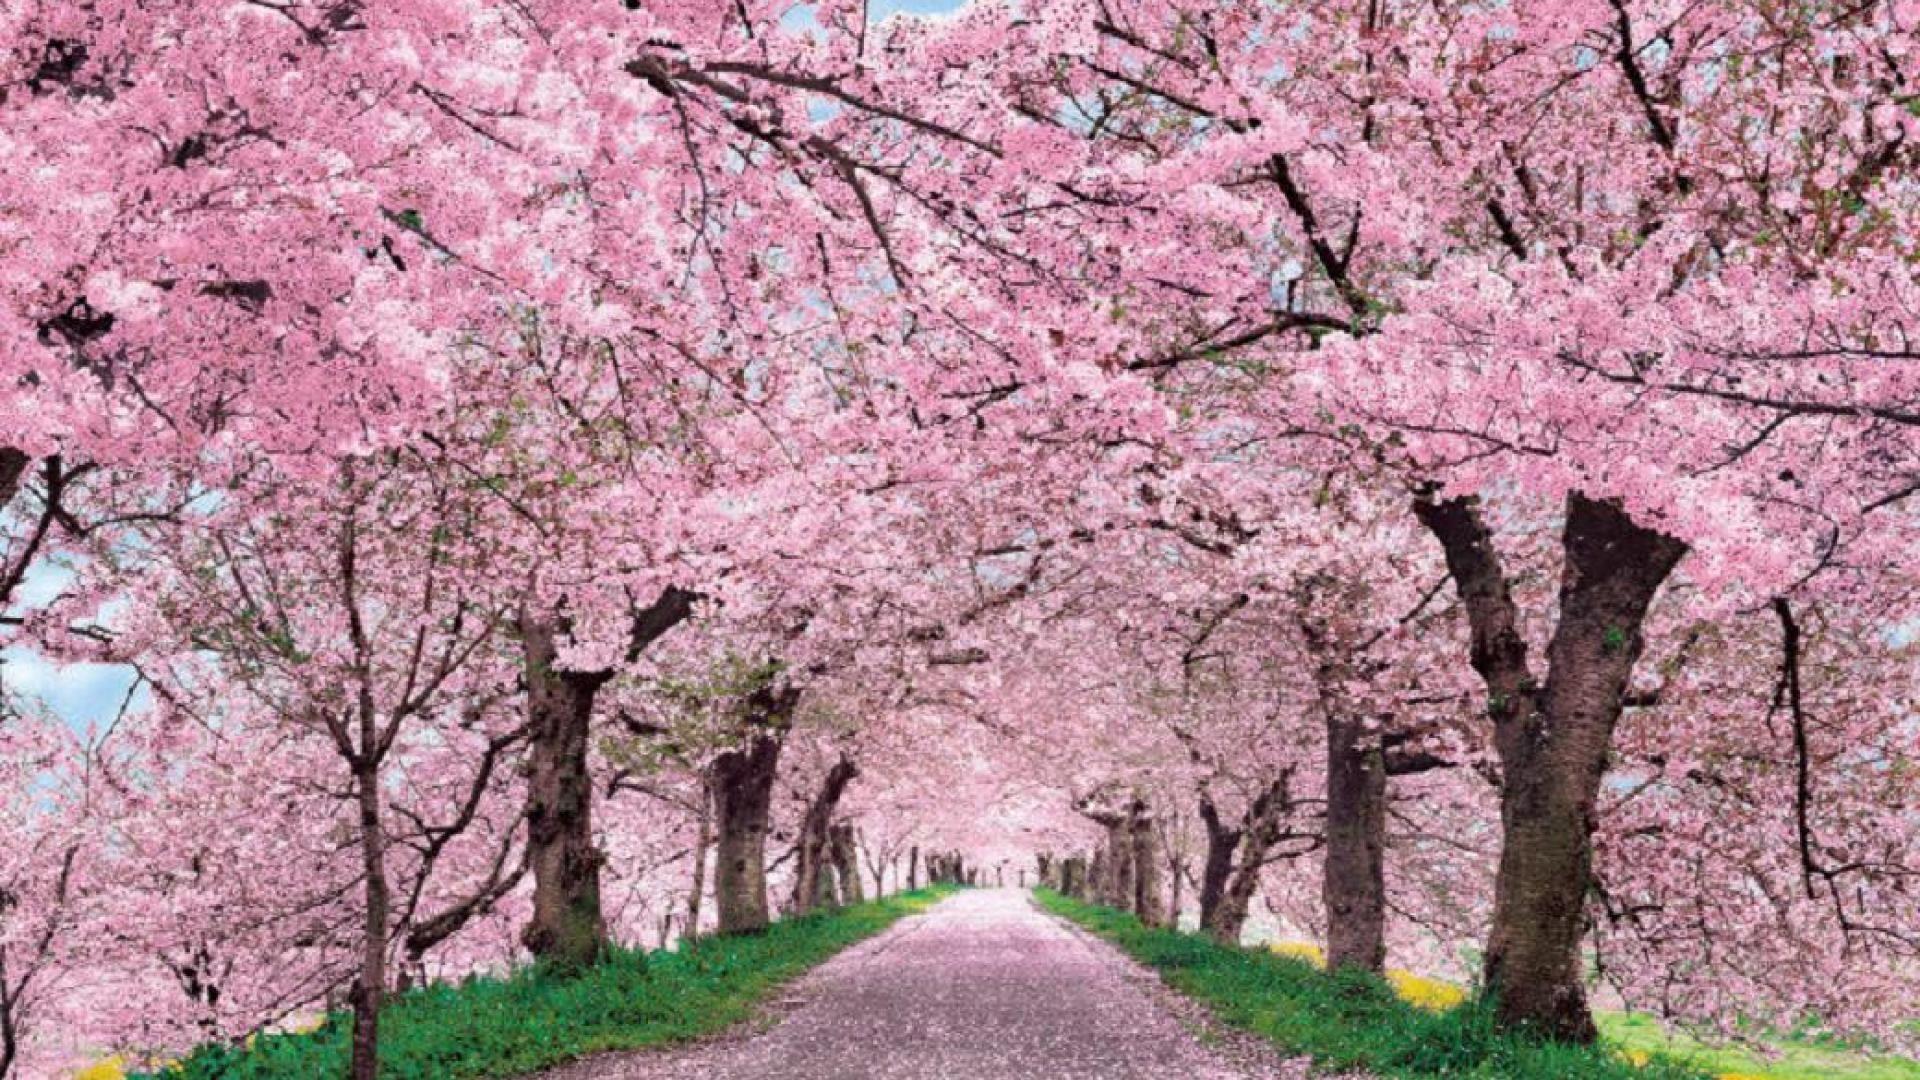 Pin by B K on Sakura / various blossoms | Blossom trees, Cherry ...